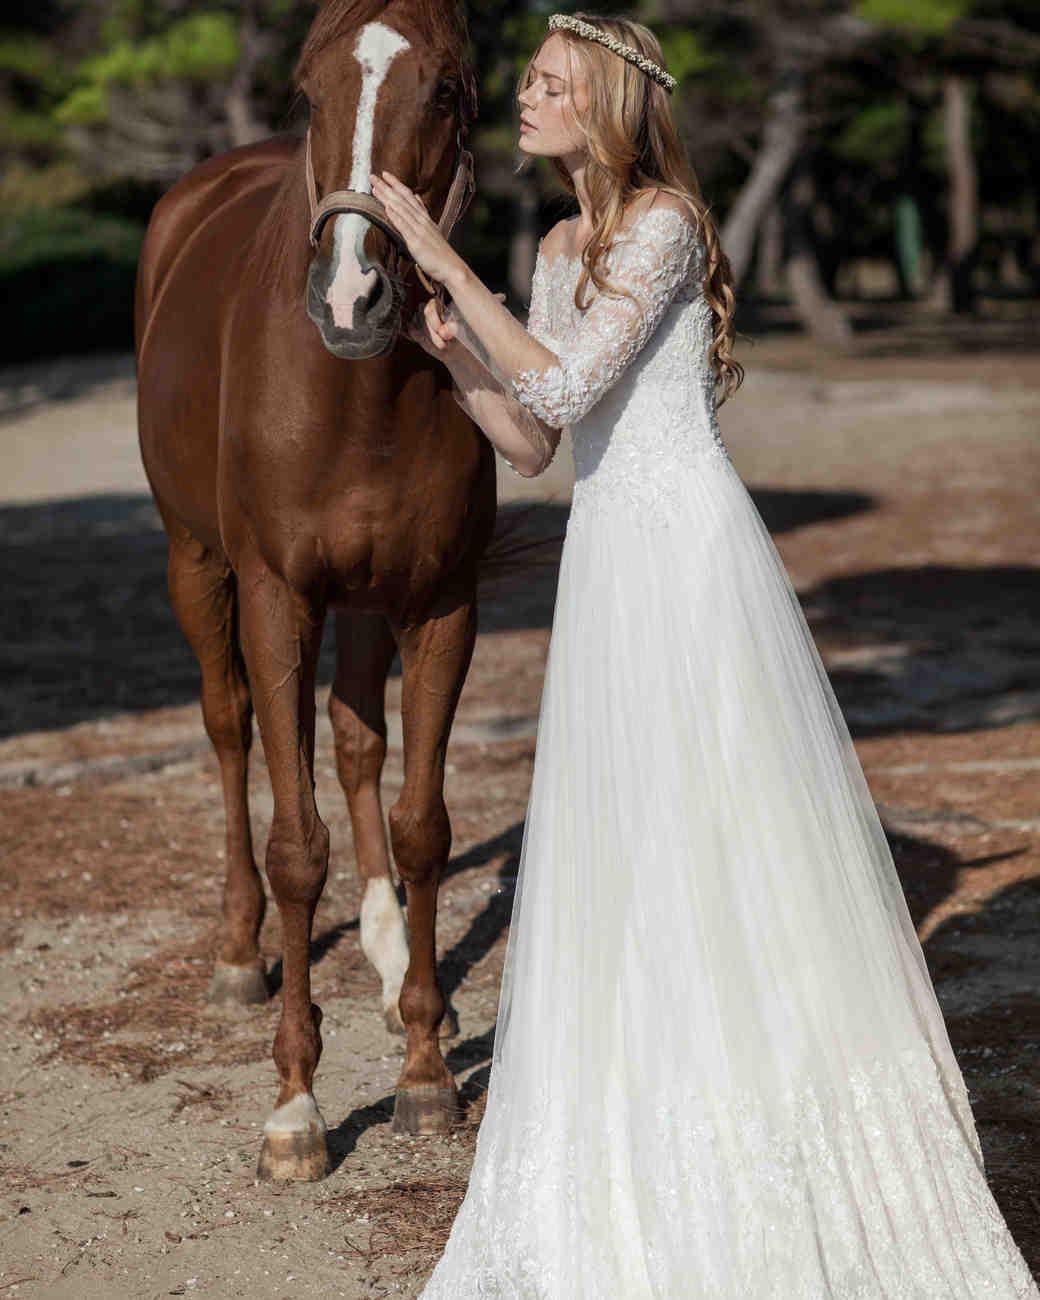 costarellos-fall2016-wedding-dress-16-49.jpg